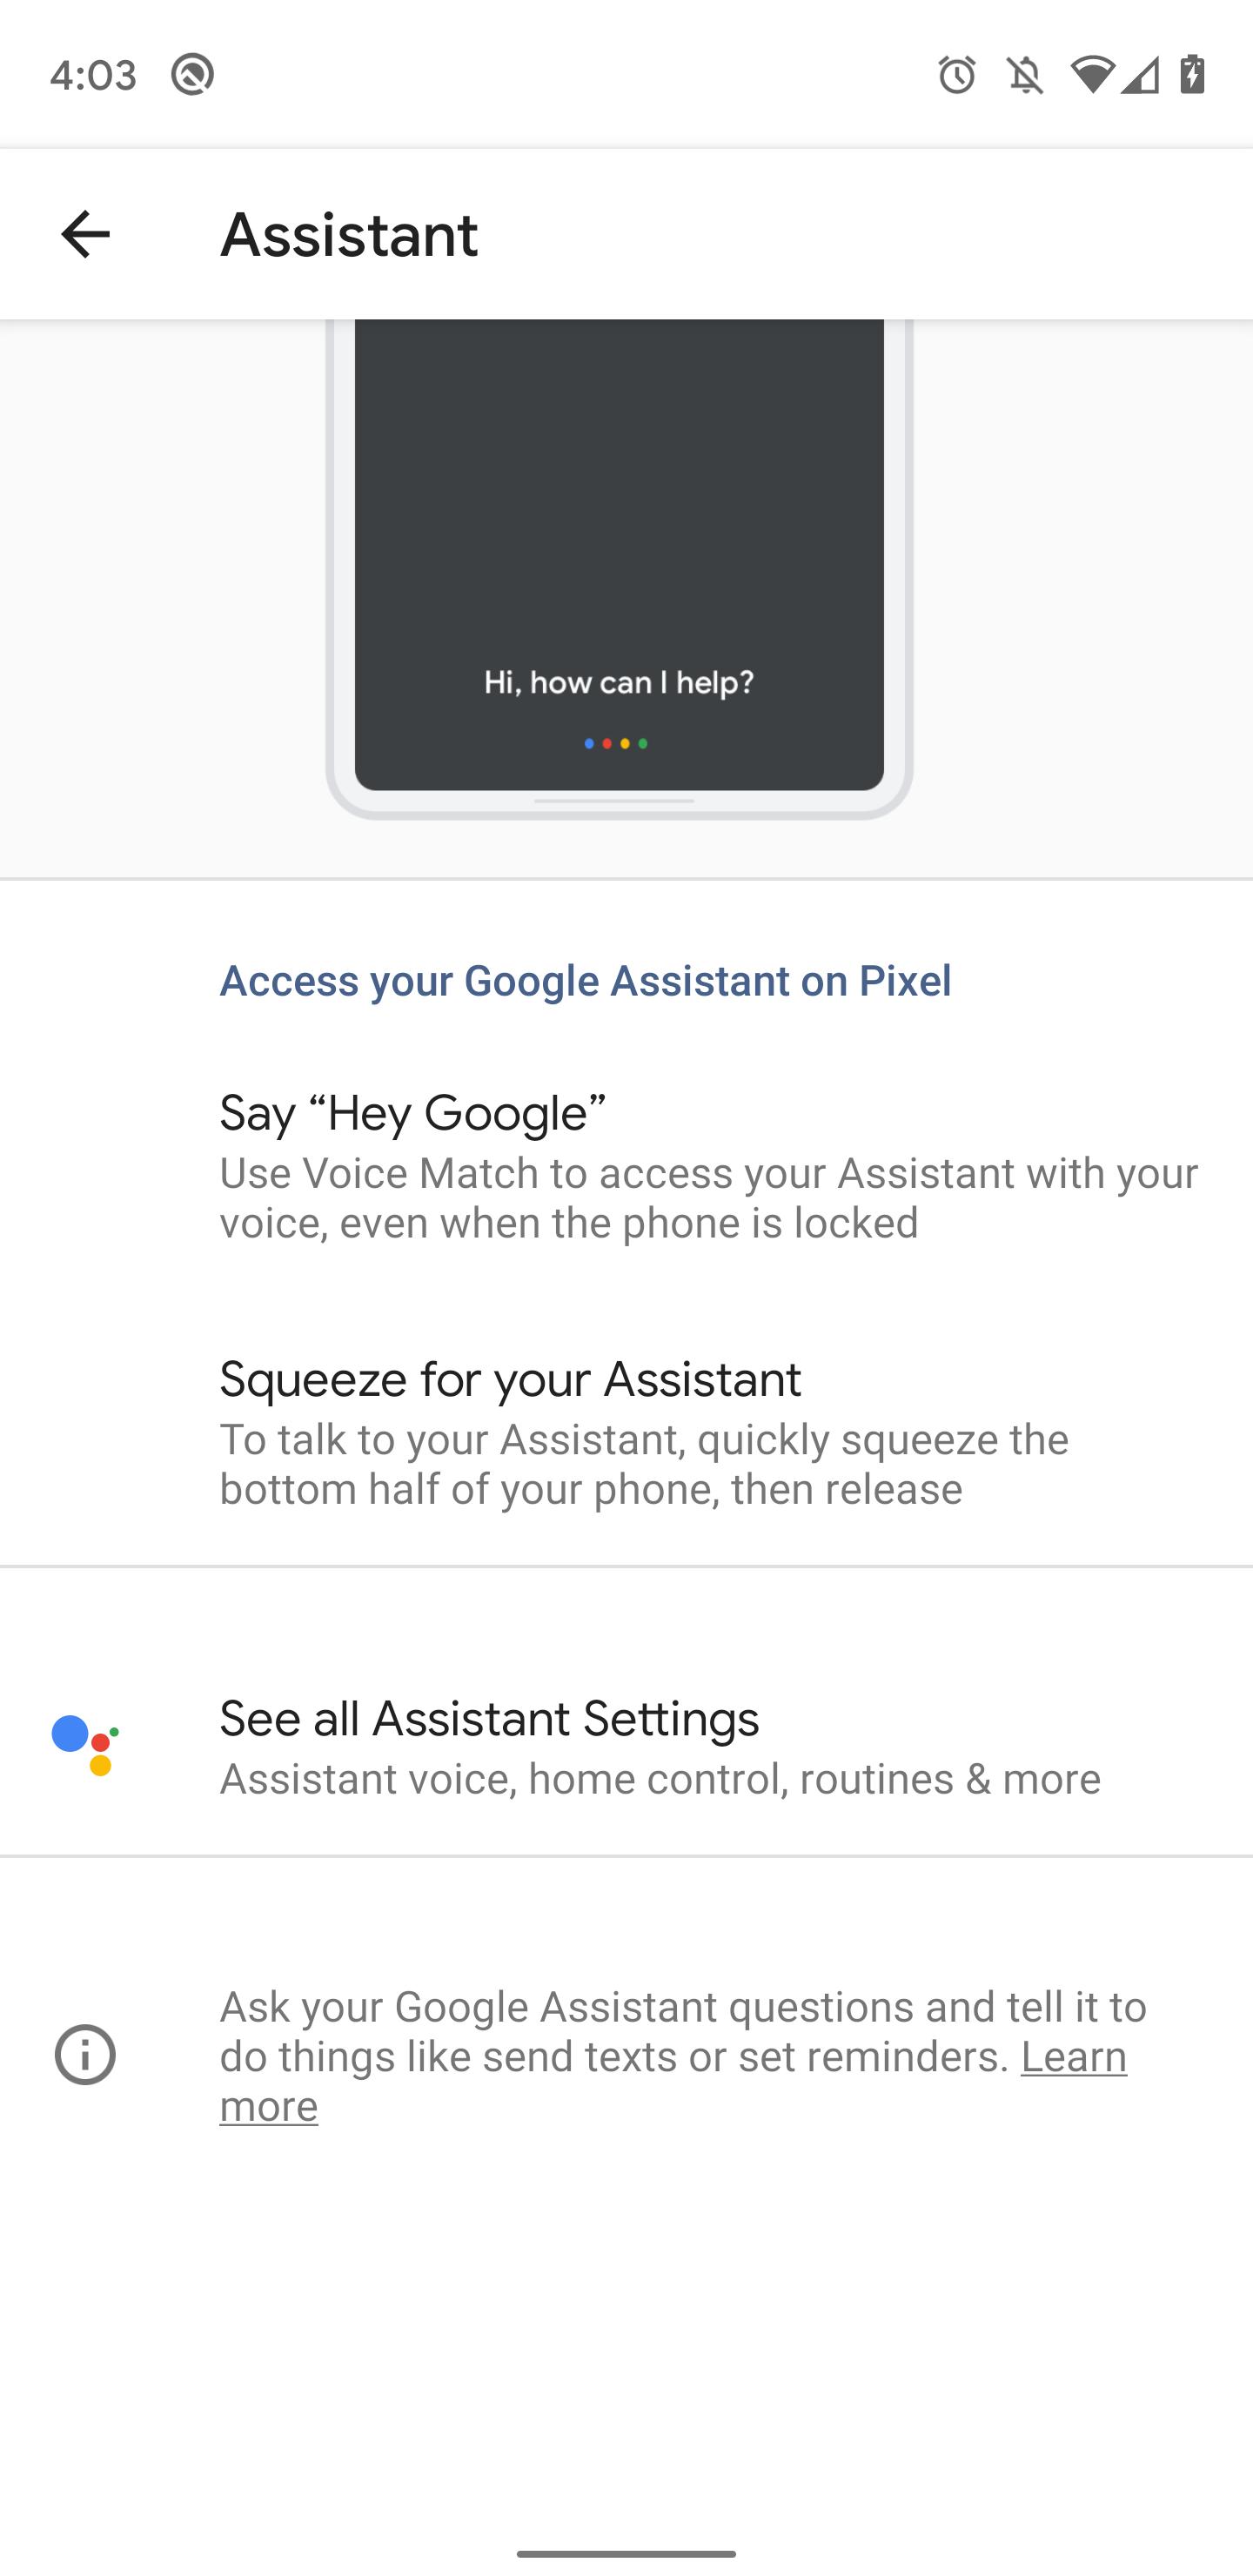 Google app 10 38 preps Pixel settings for Assistant, hints at Pixel